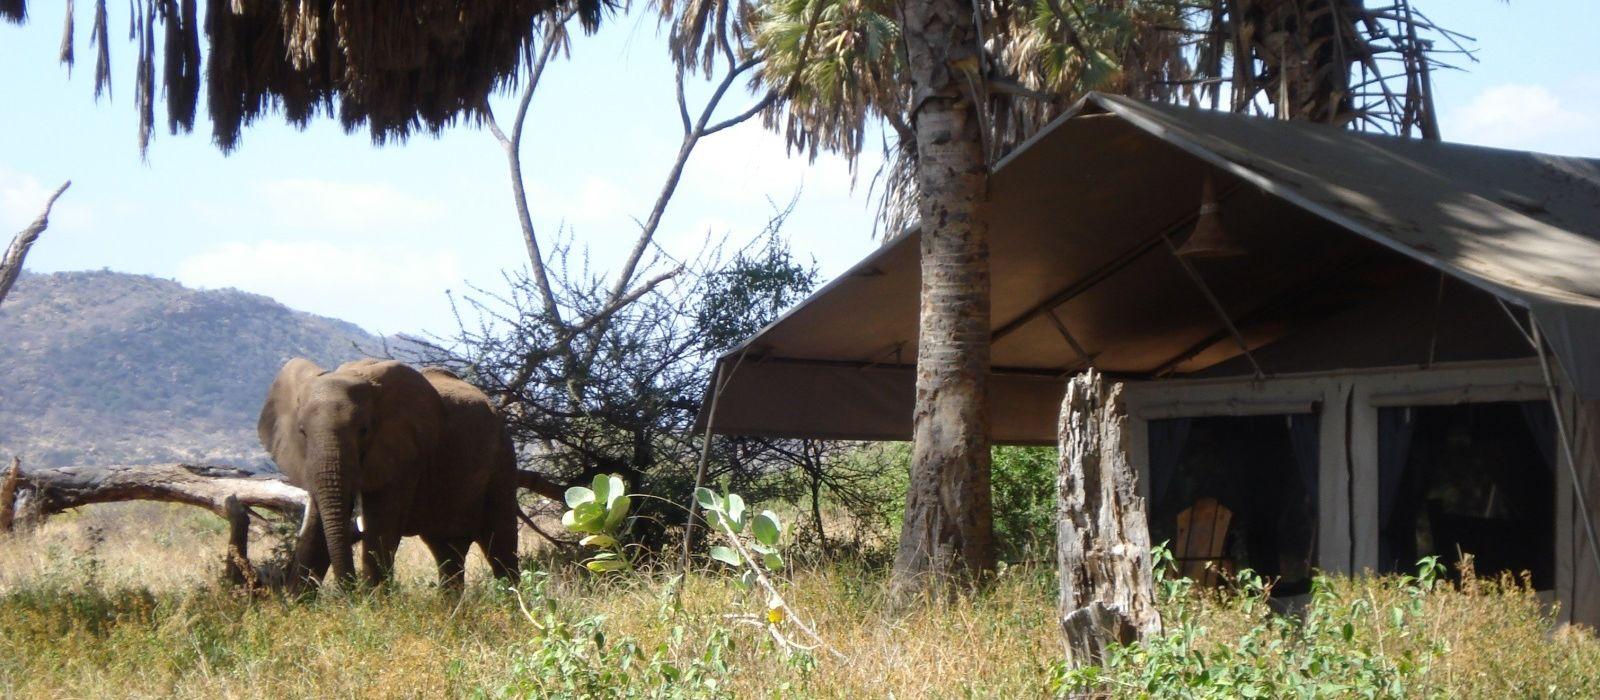 Elephant Bedroom Camp Hotel In Kenya